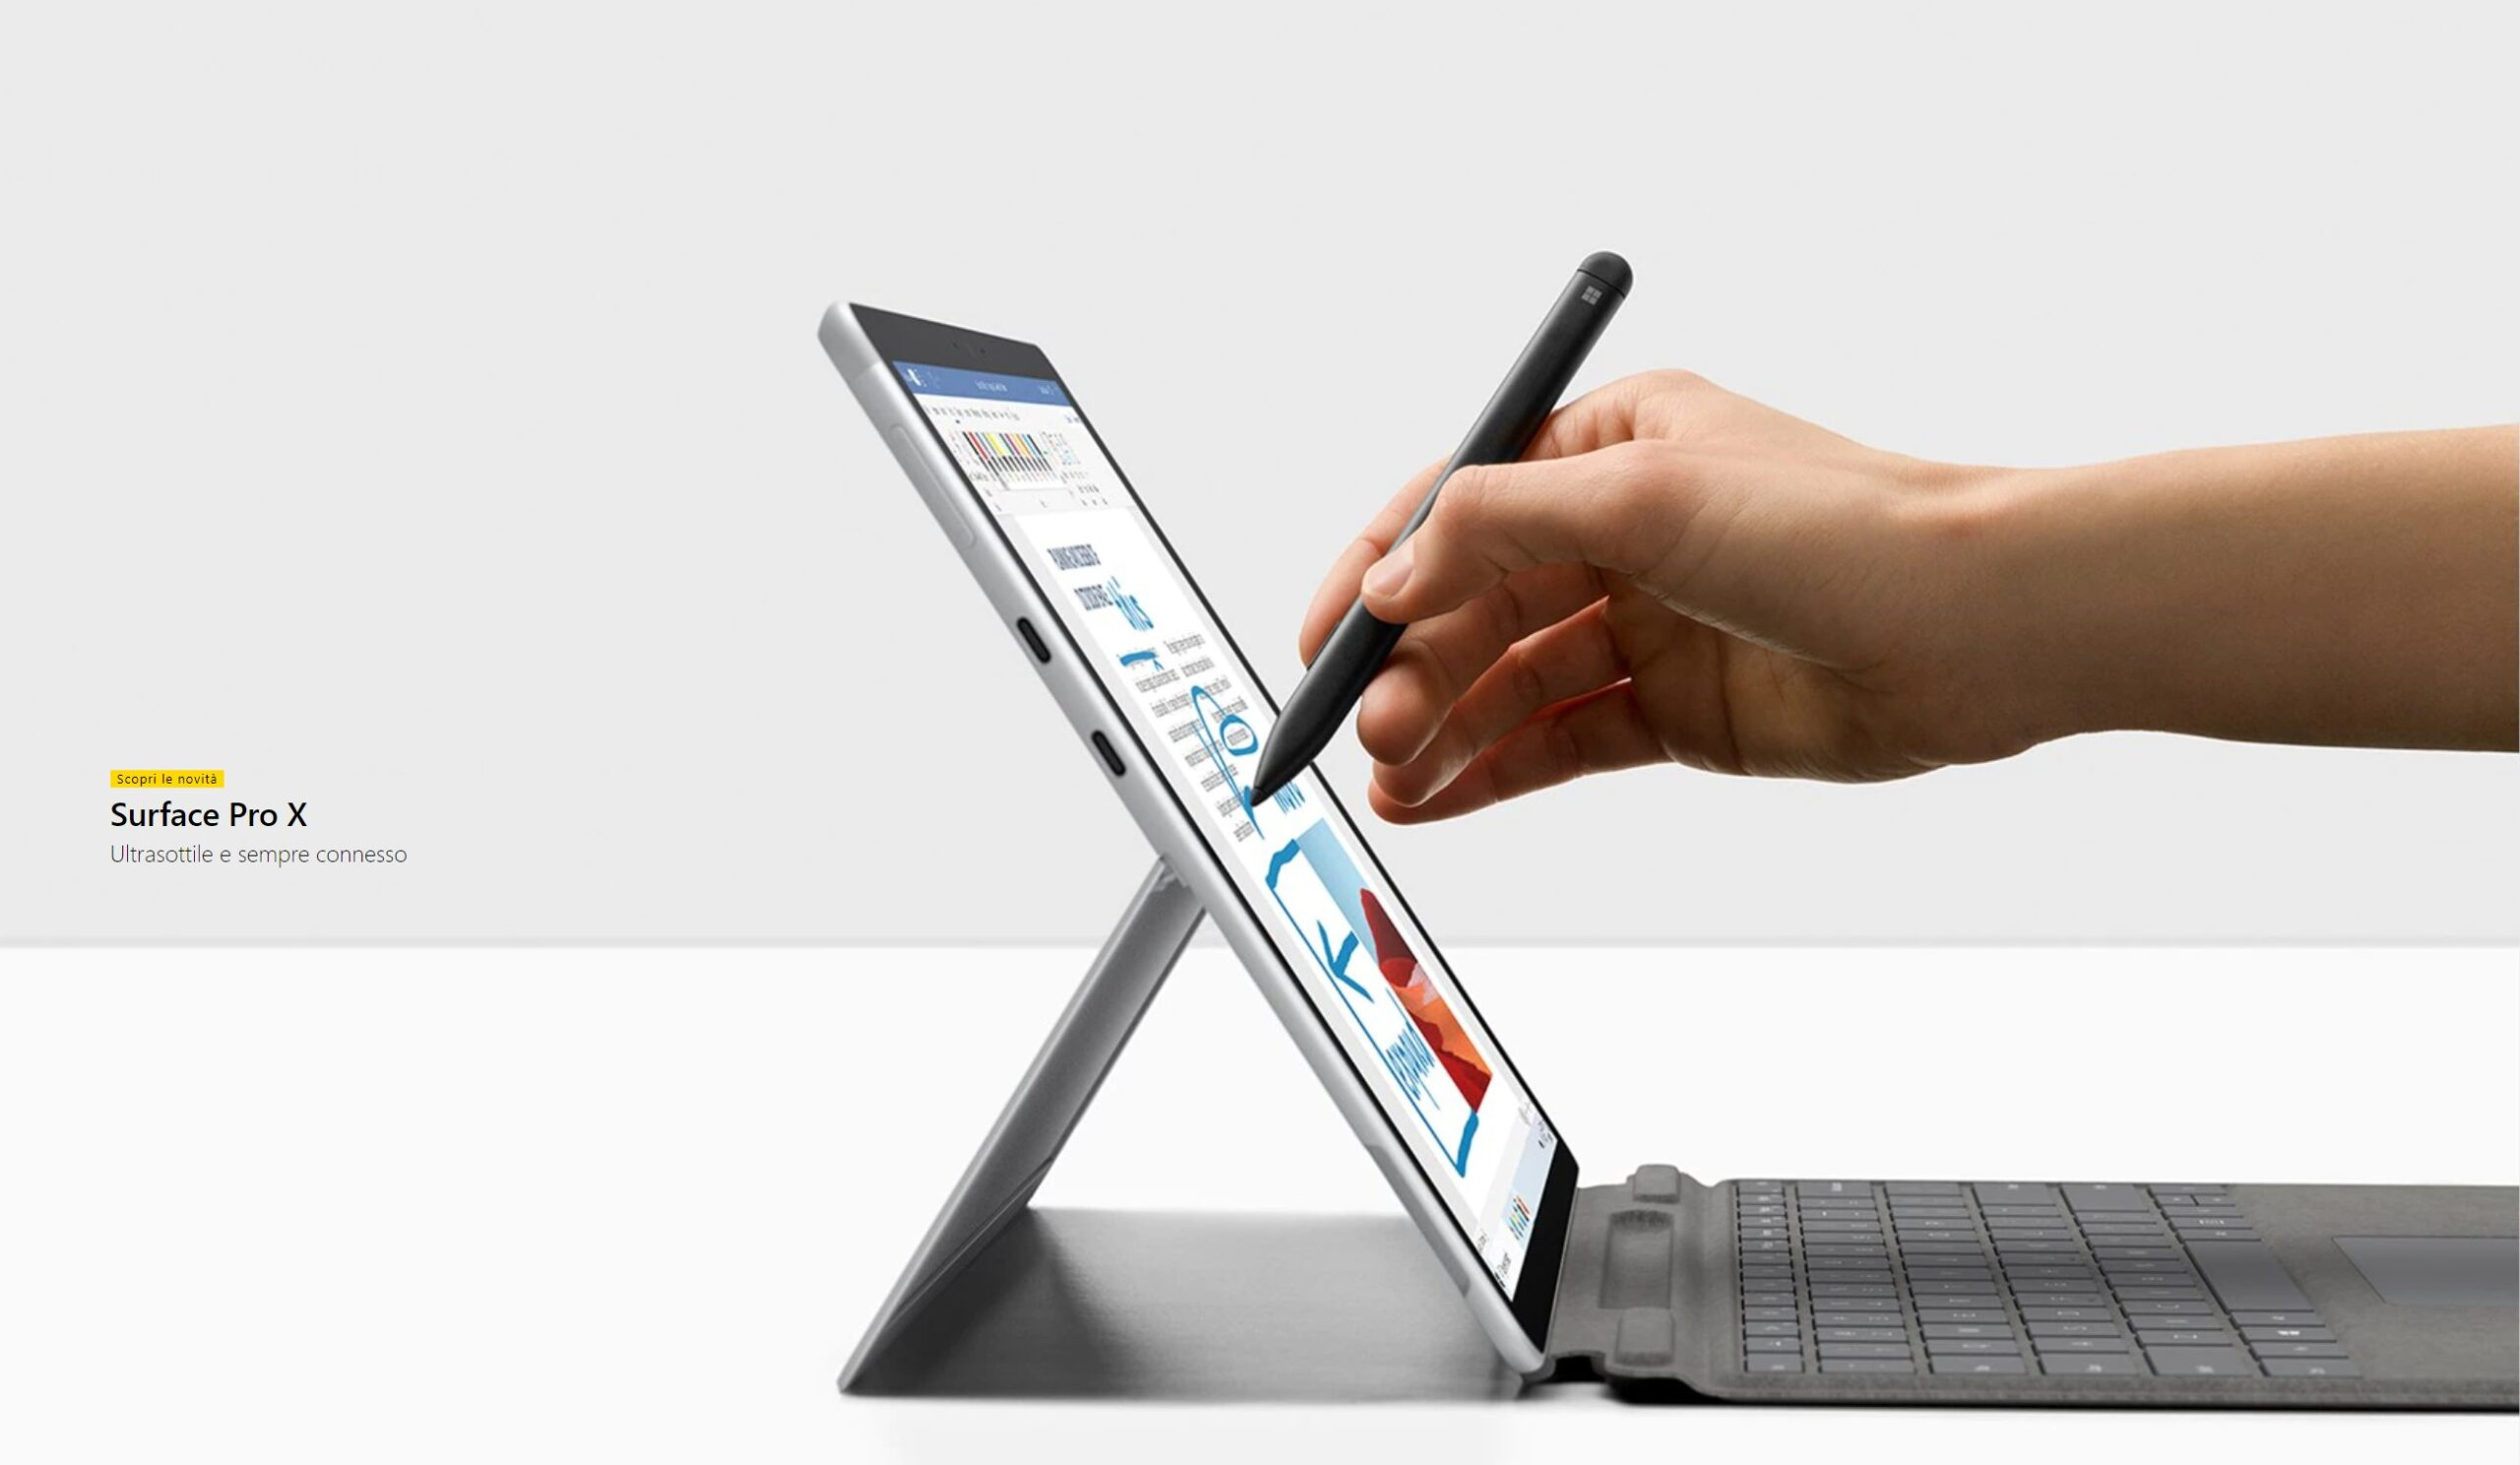 Surface Pro X club 33 informatica srl